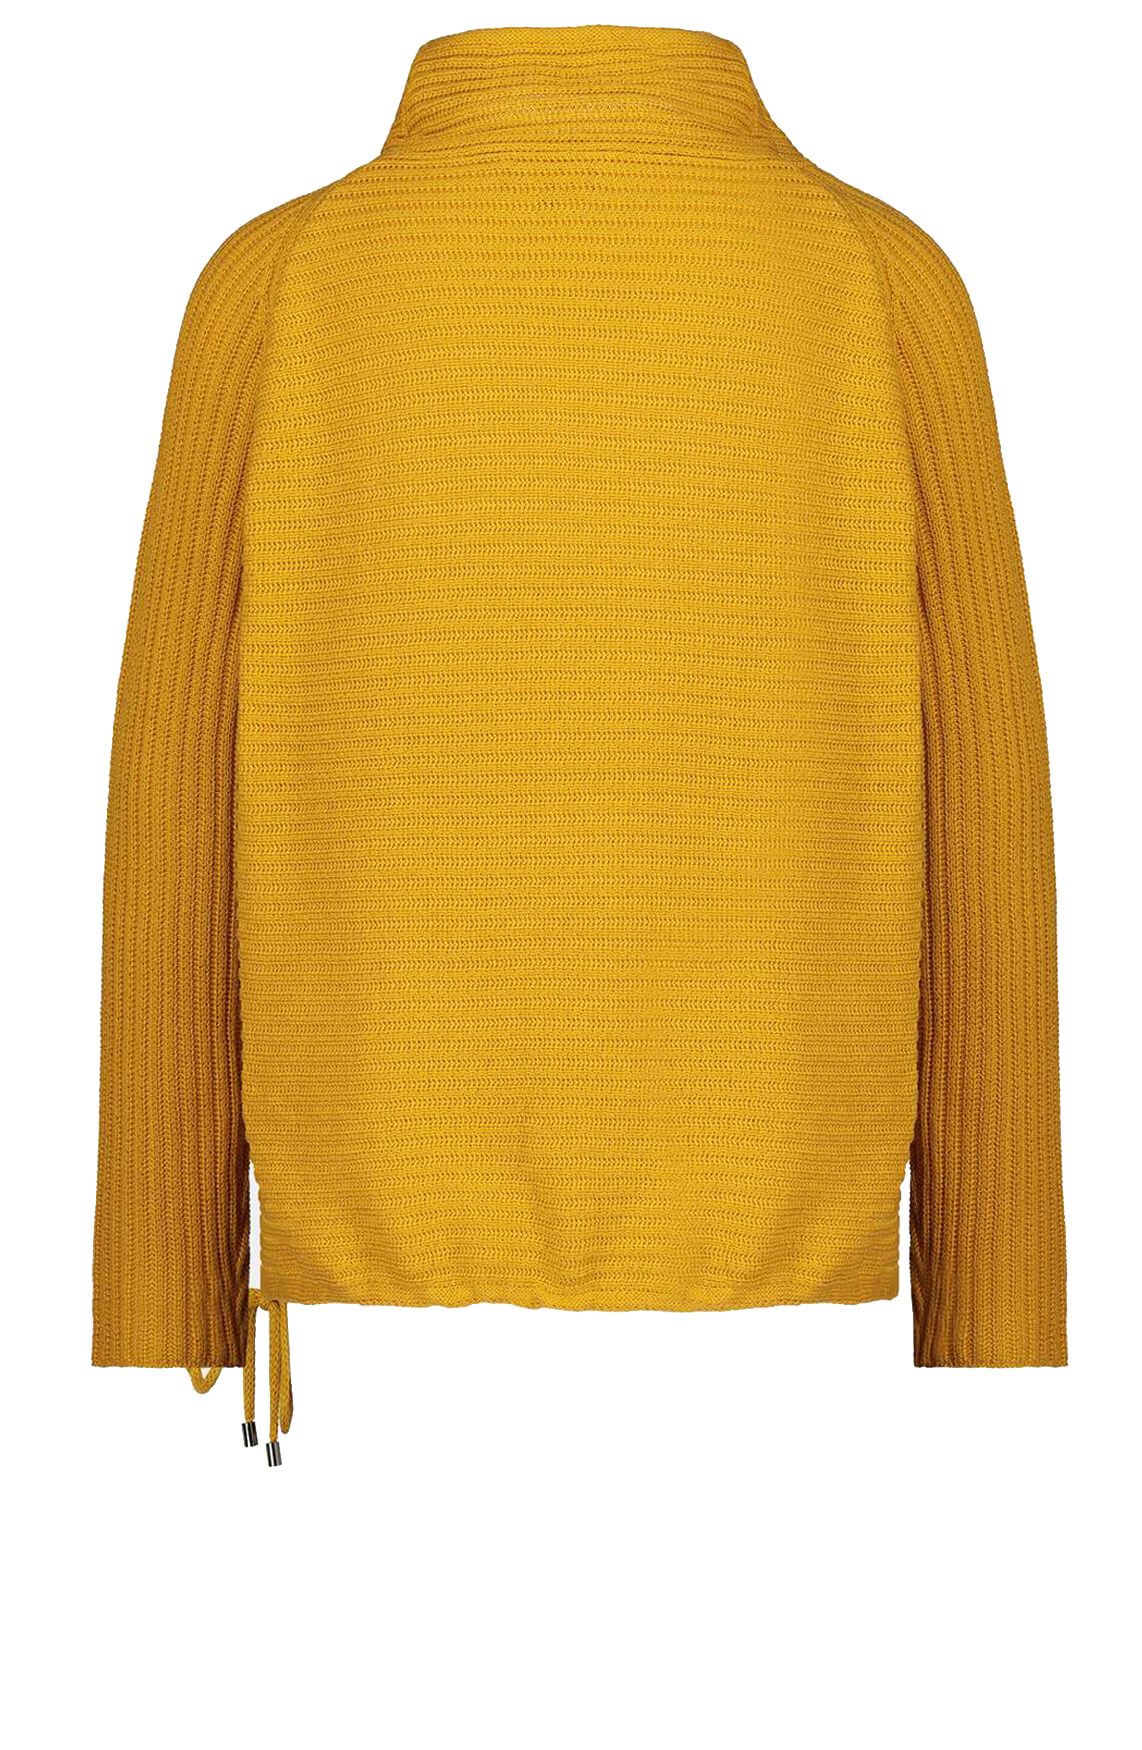 Monari Dames Pullover met col geel